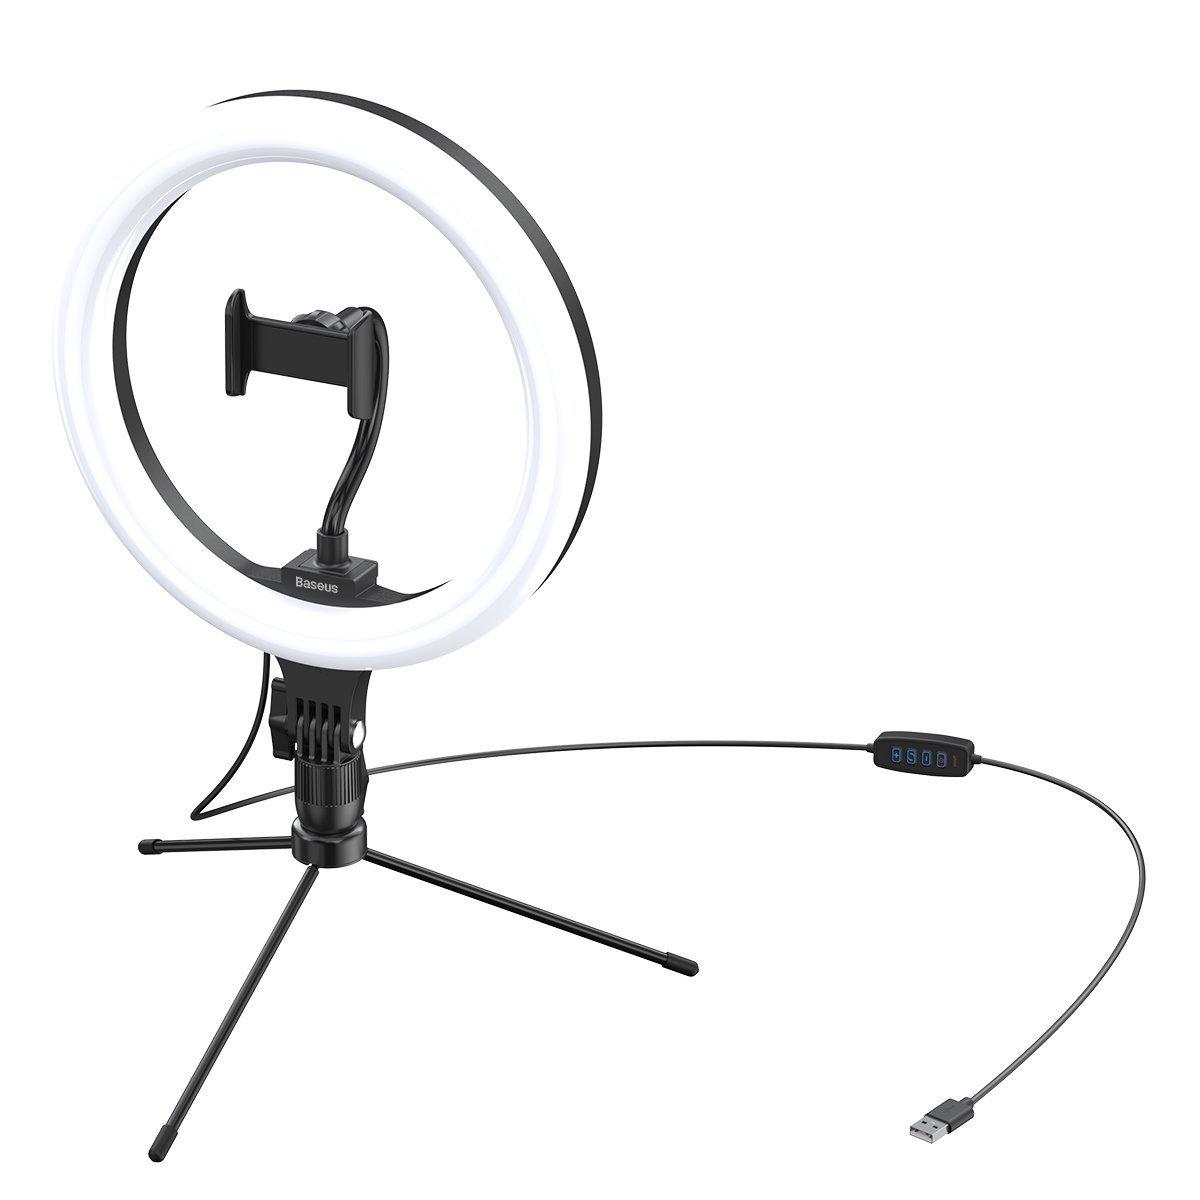 Baseus Live Stream Holder Stand 12' Black  - 2